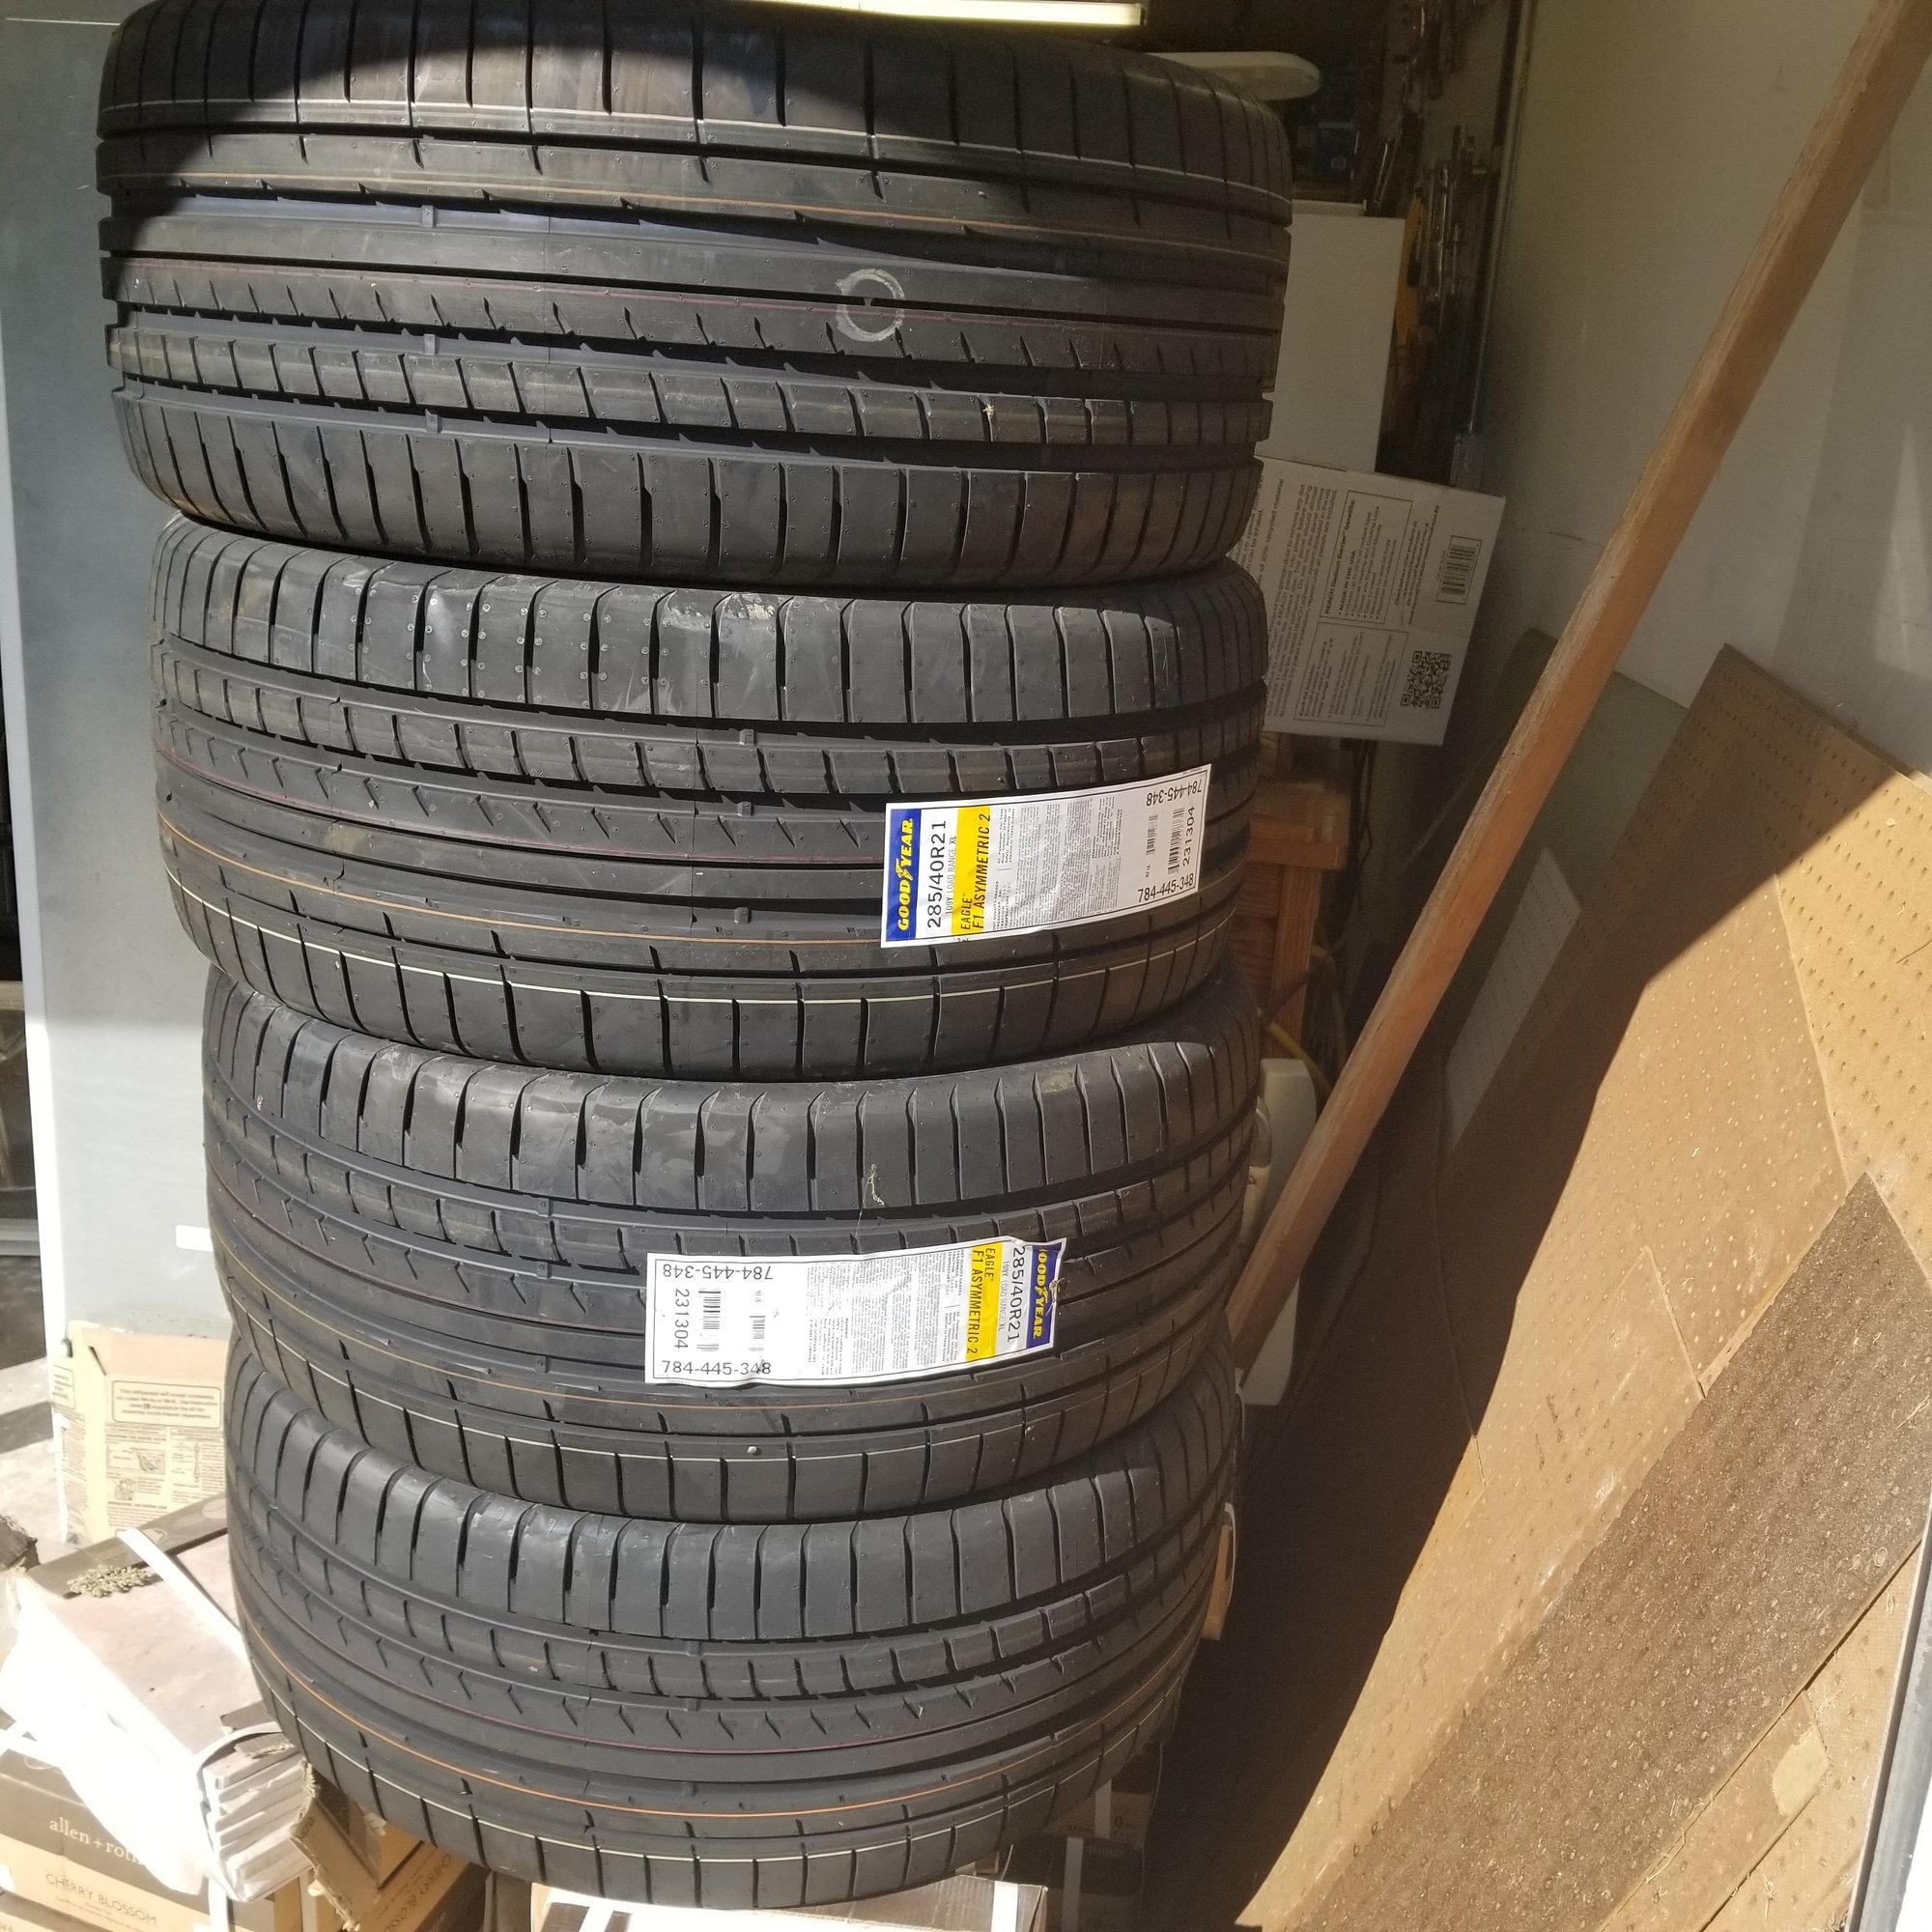 Audi Q7 Goodyear Eagle 285/40R21 Tires Set Of 4